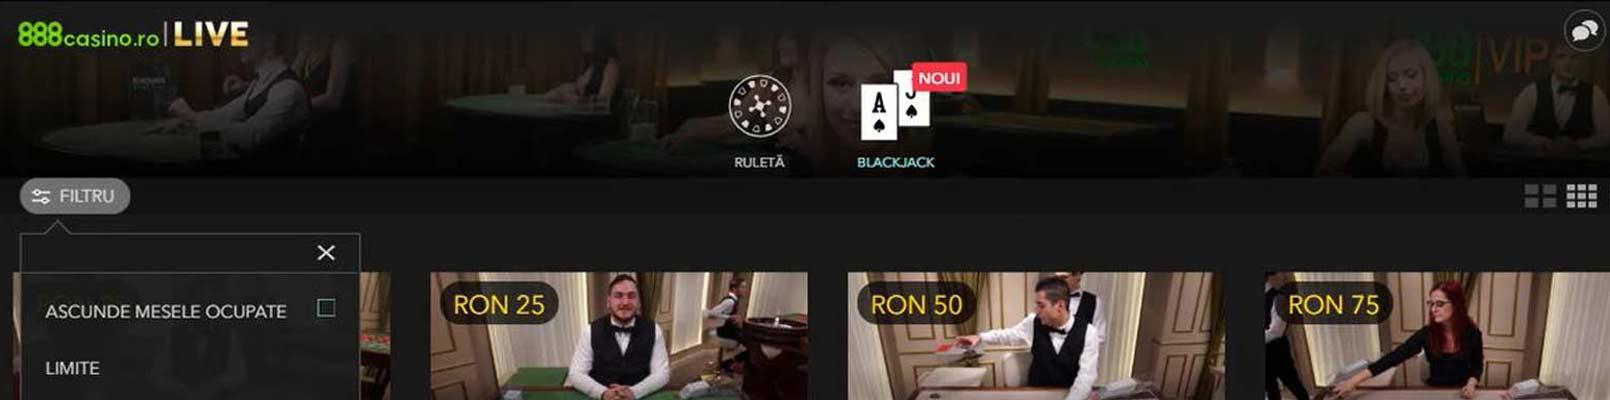 888 casino mese live blackjack